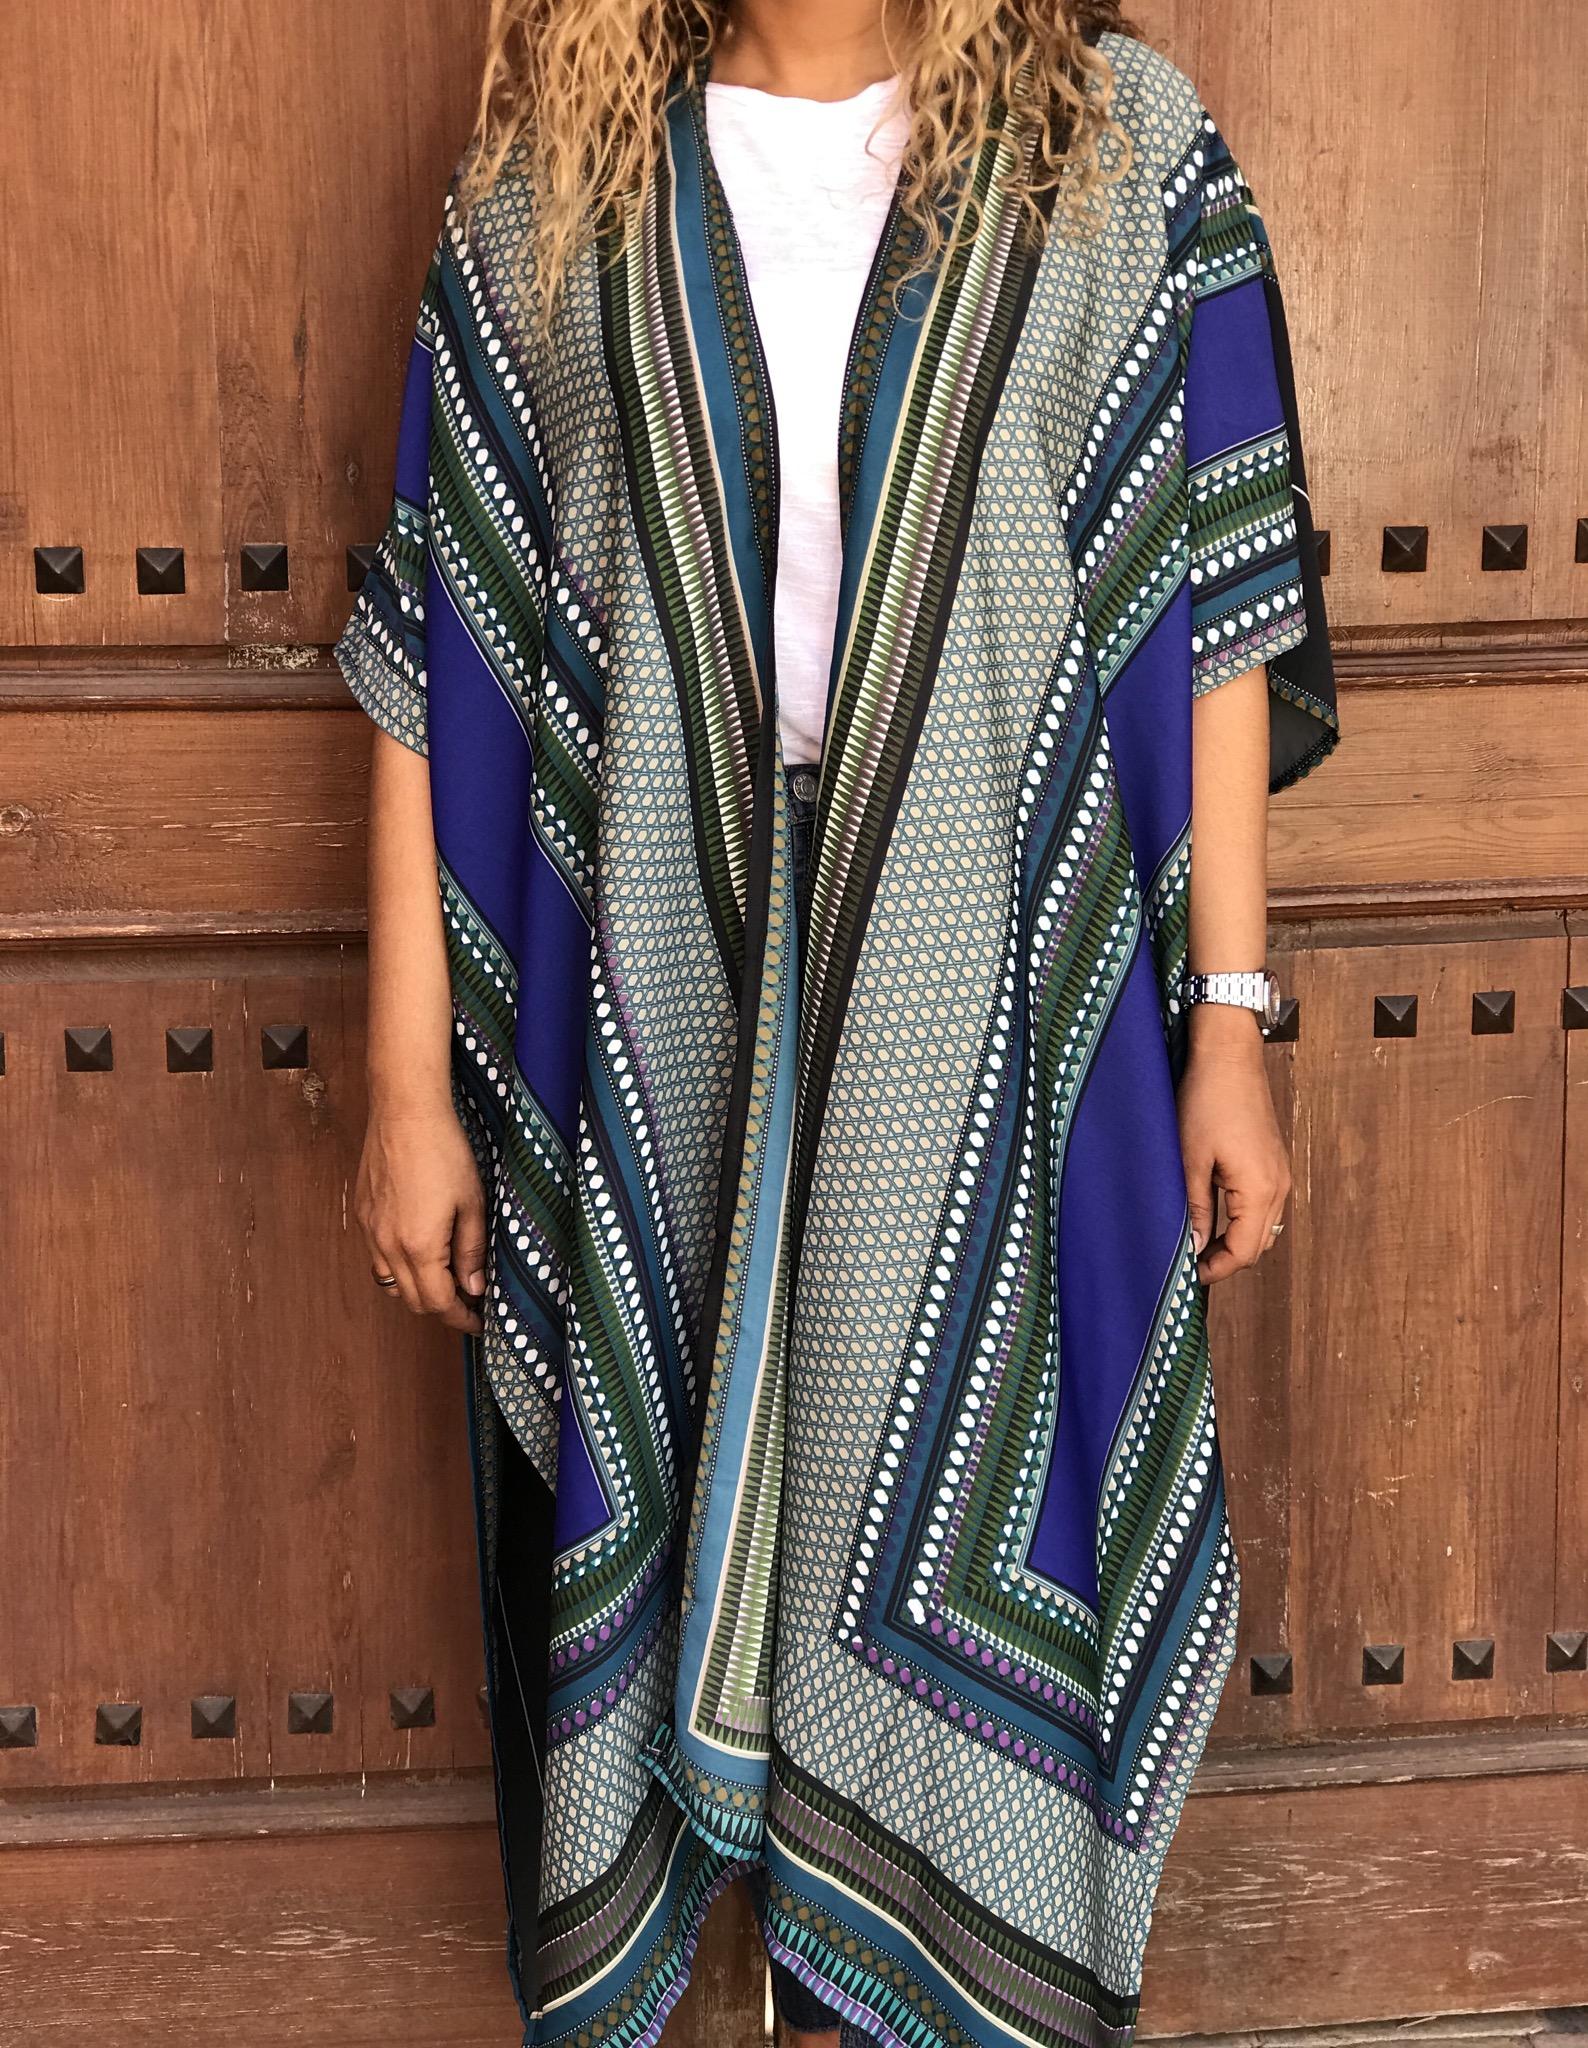 Kimono crêpe de Chine blue majorelle green purple cream